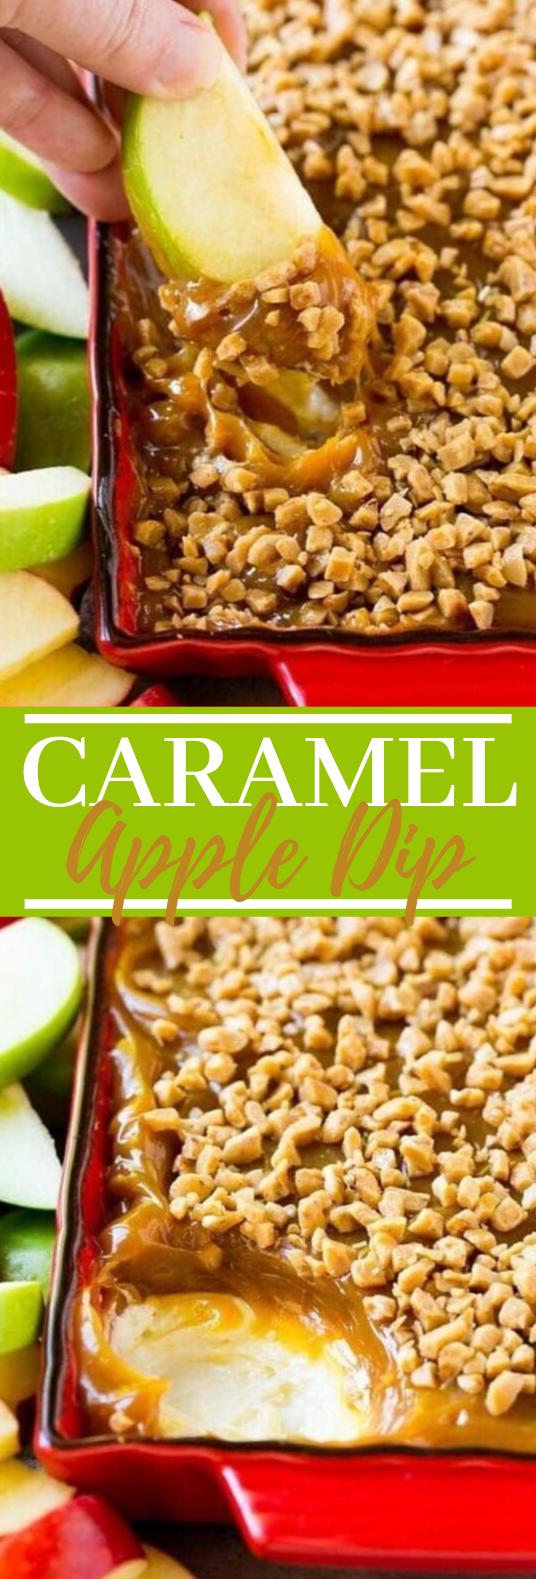 Caramel Apple Dip #desserts #apple